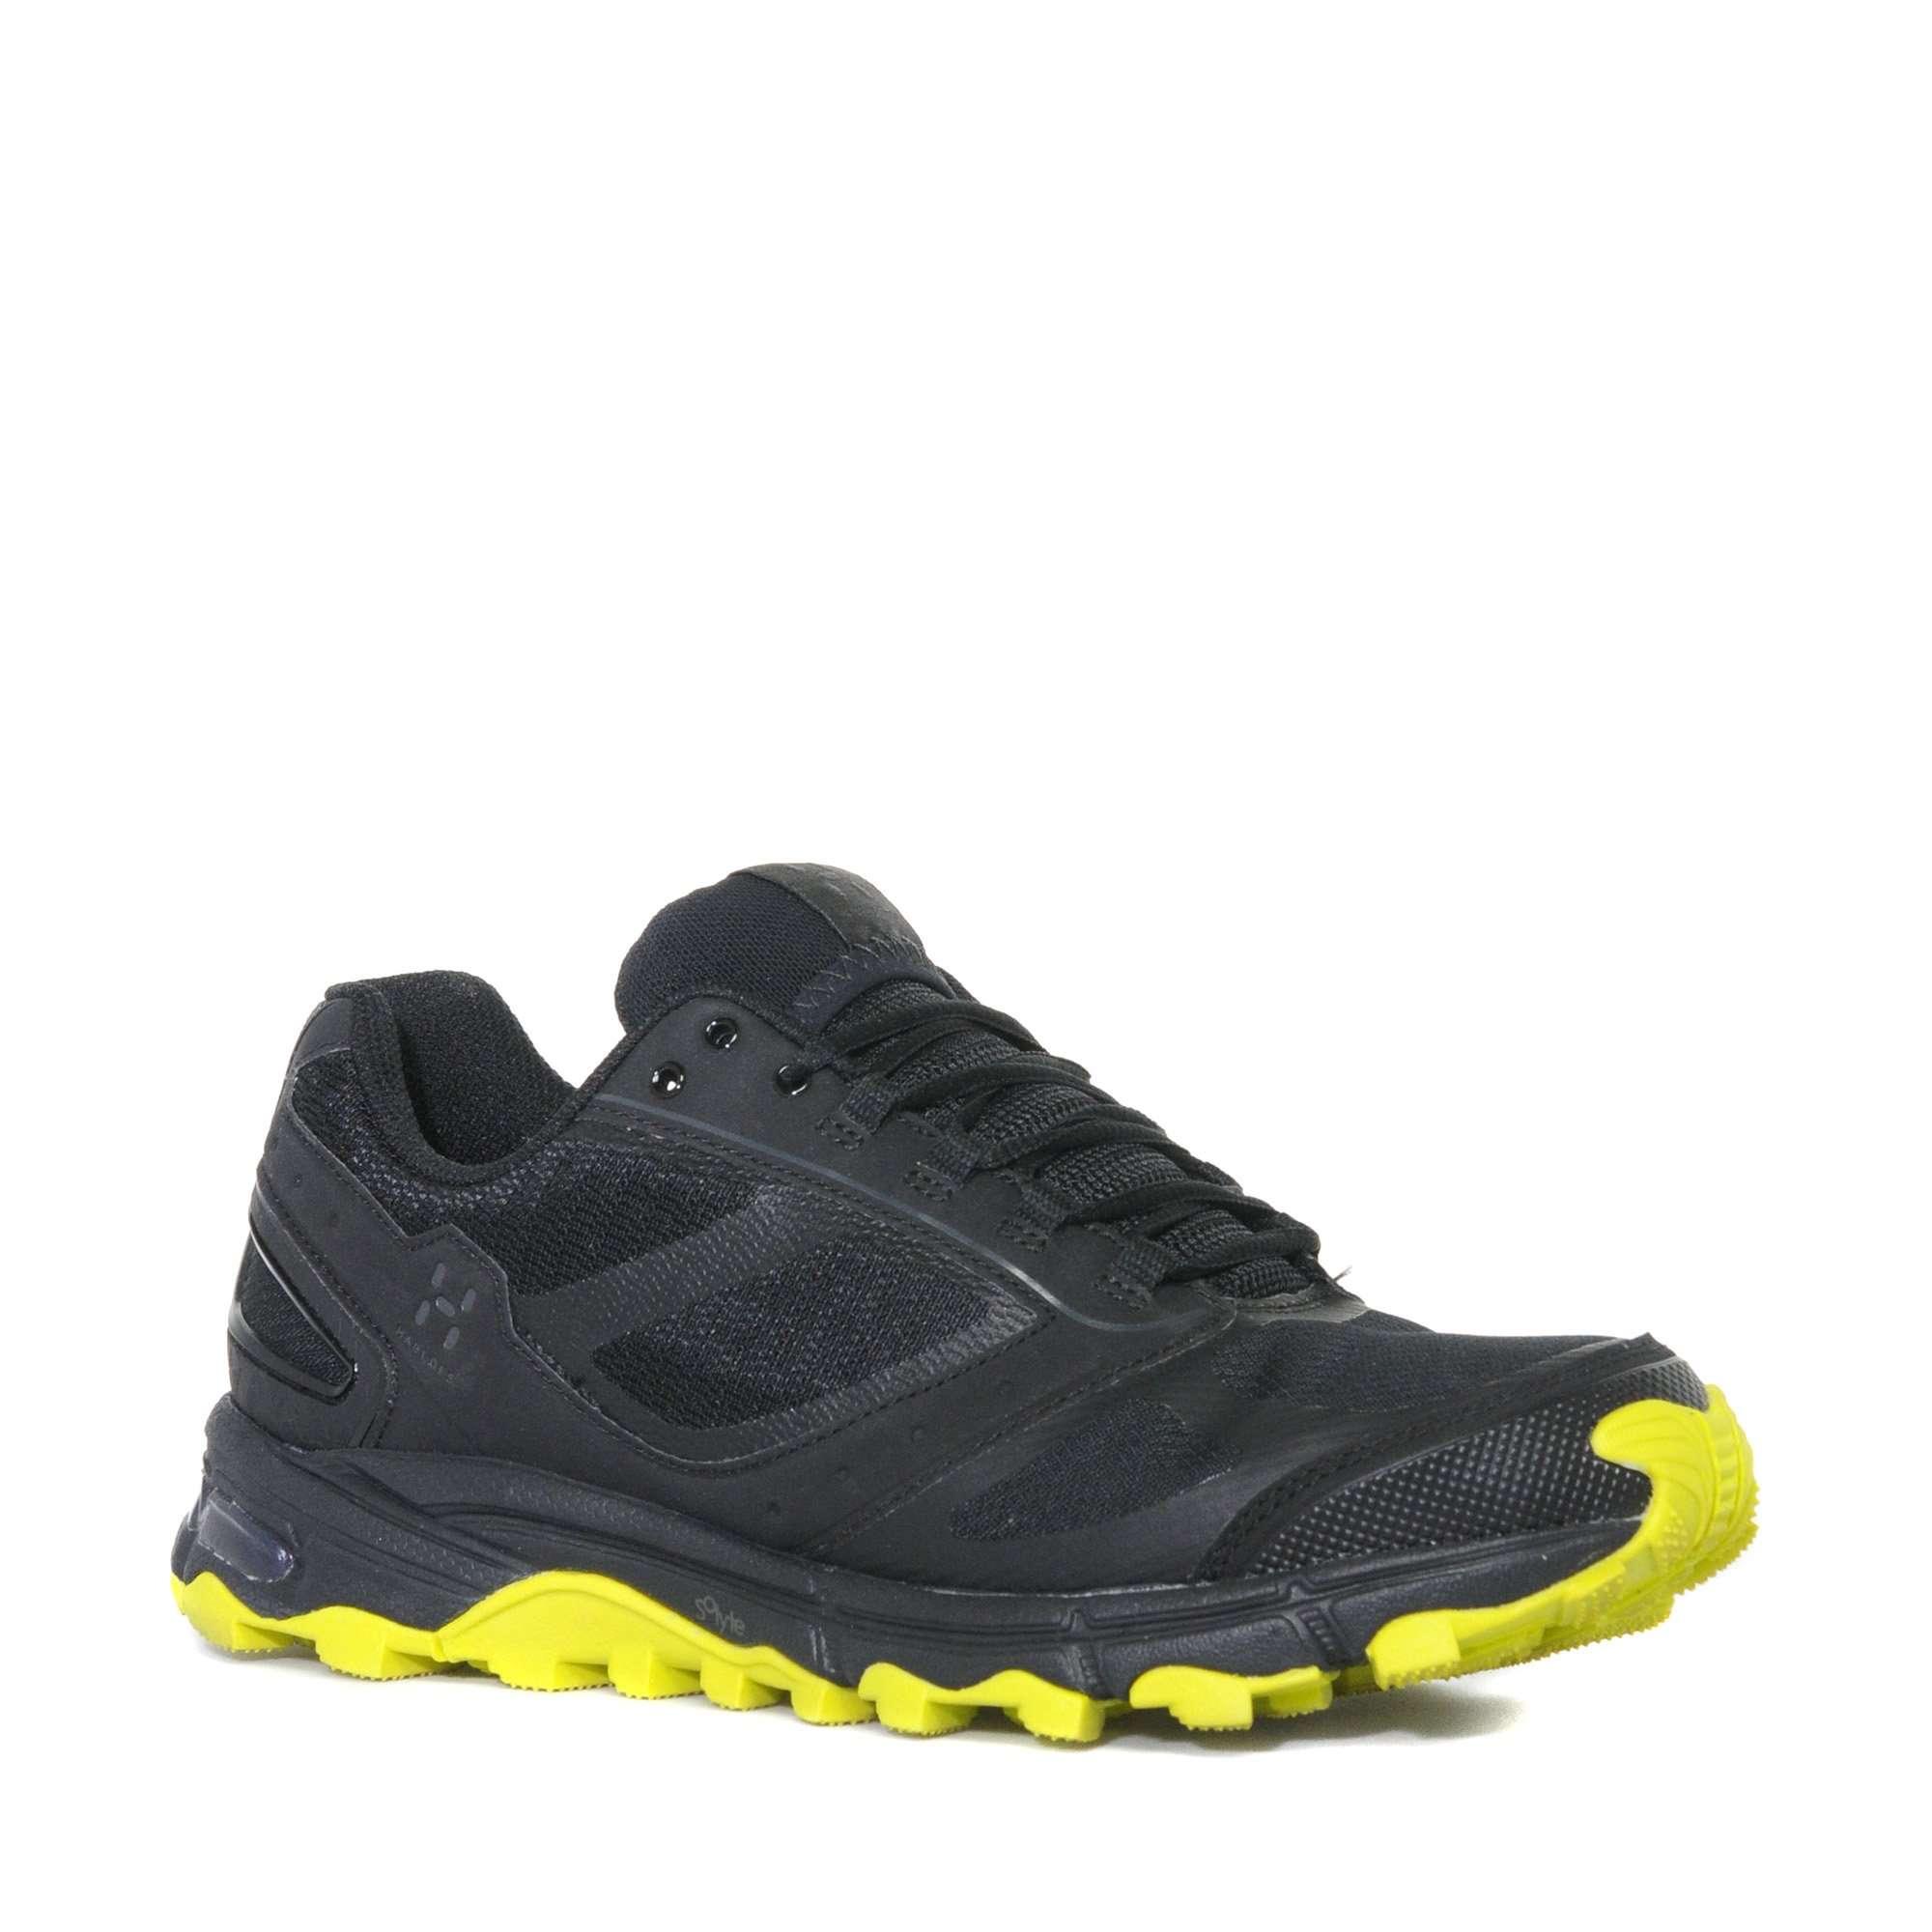 HAGLOFS Women's Gram Gravel Trail Running Shoe